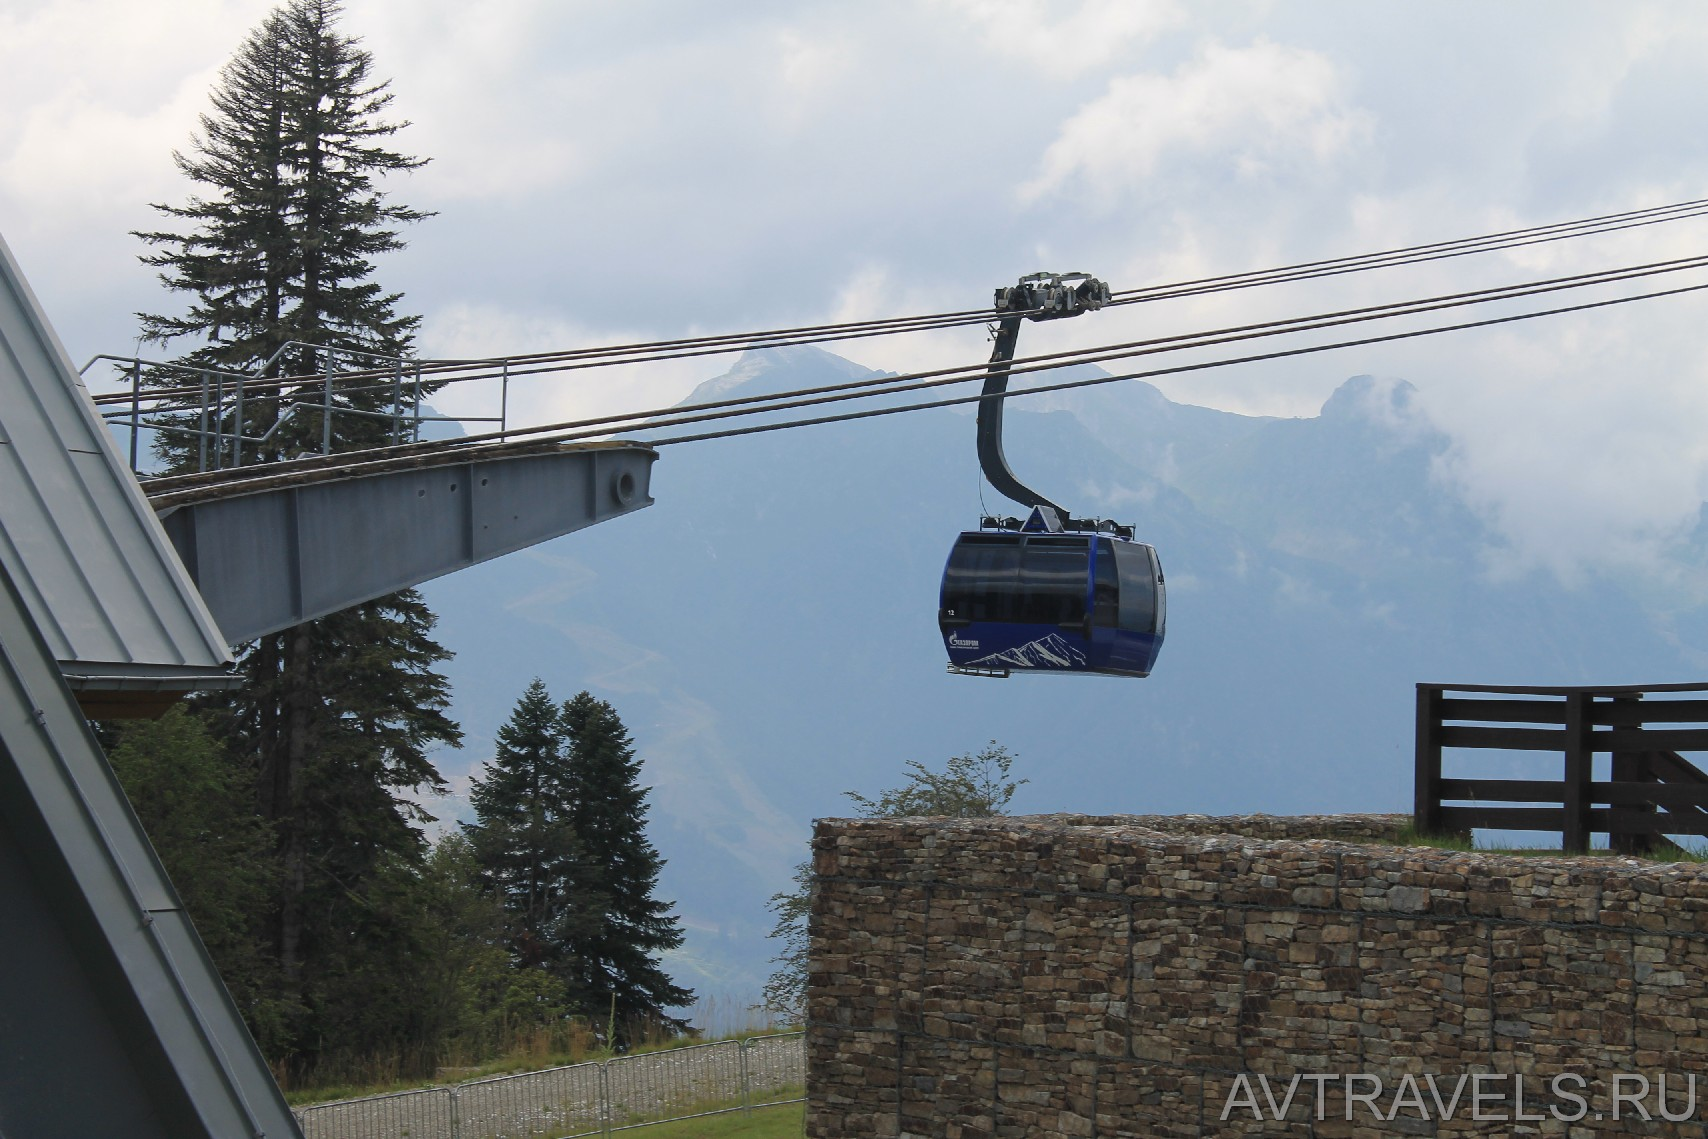 подъёмник горно-туристического центра Газпрома